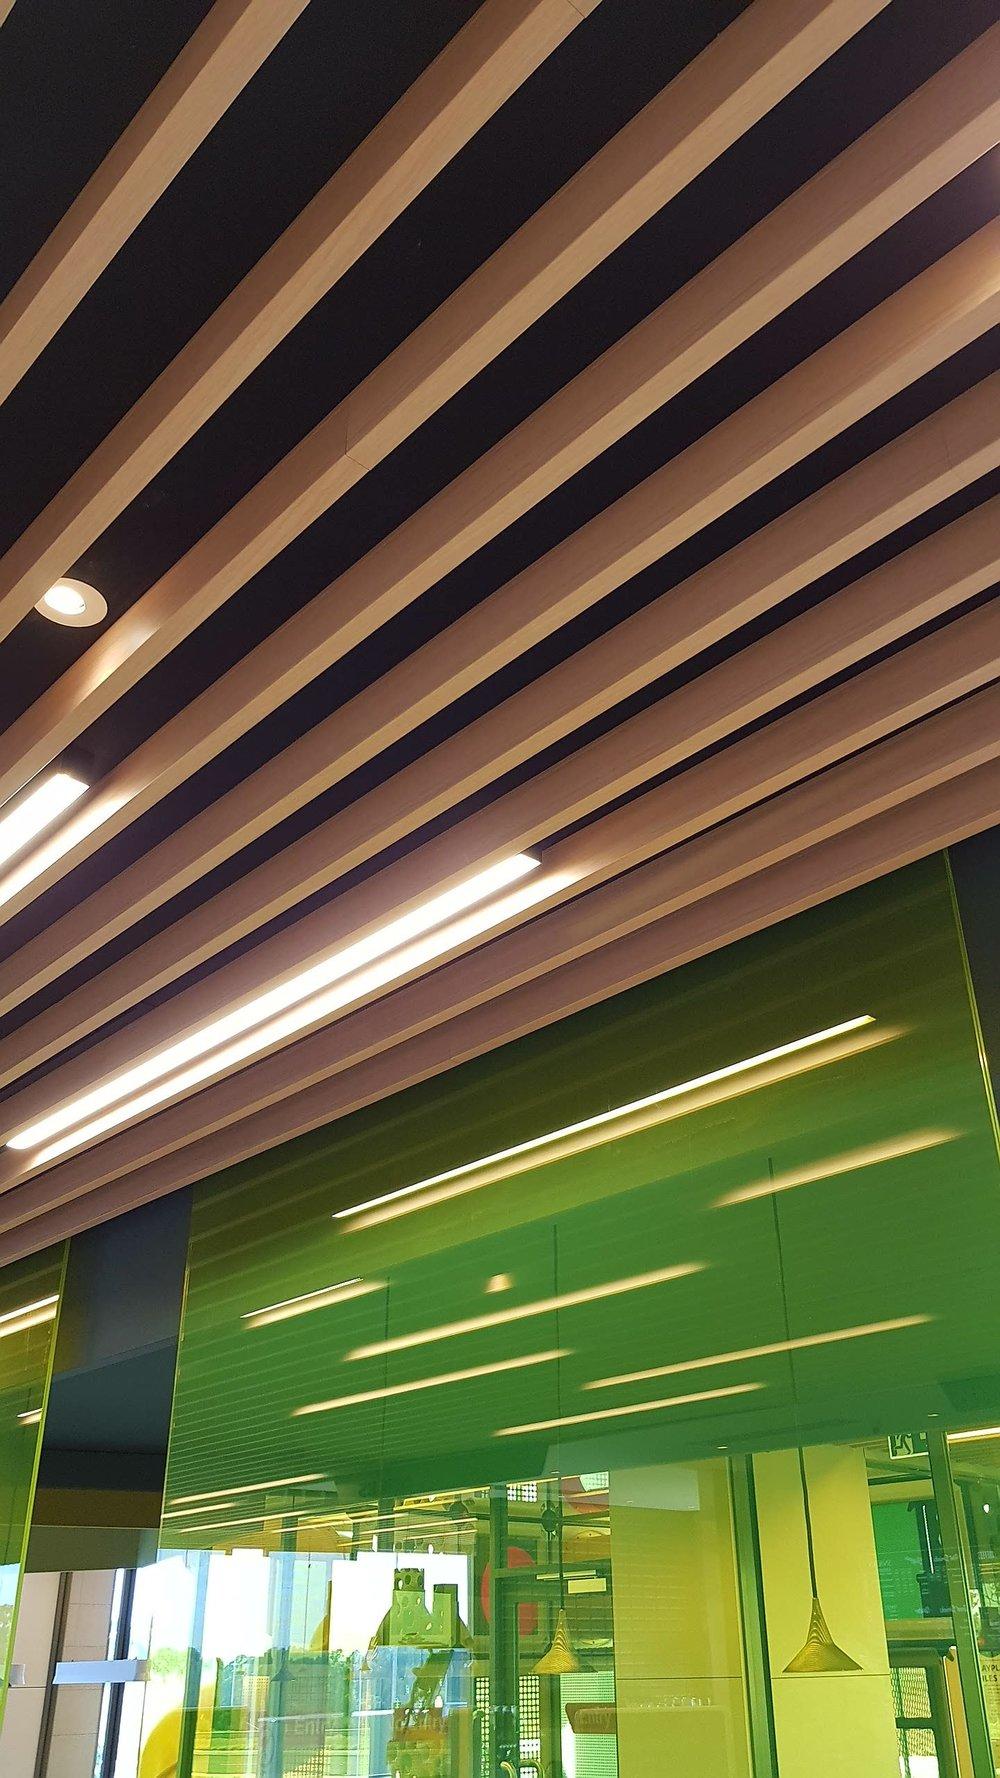 Kabebari 30x85 Supringu Oku Ceiling Battens